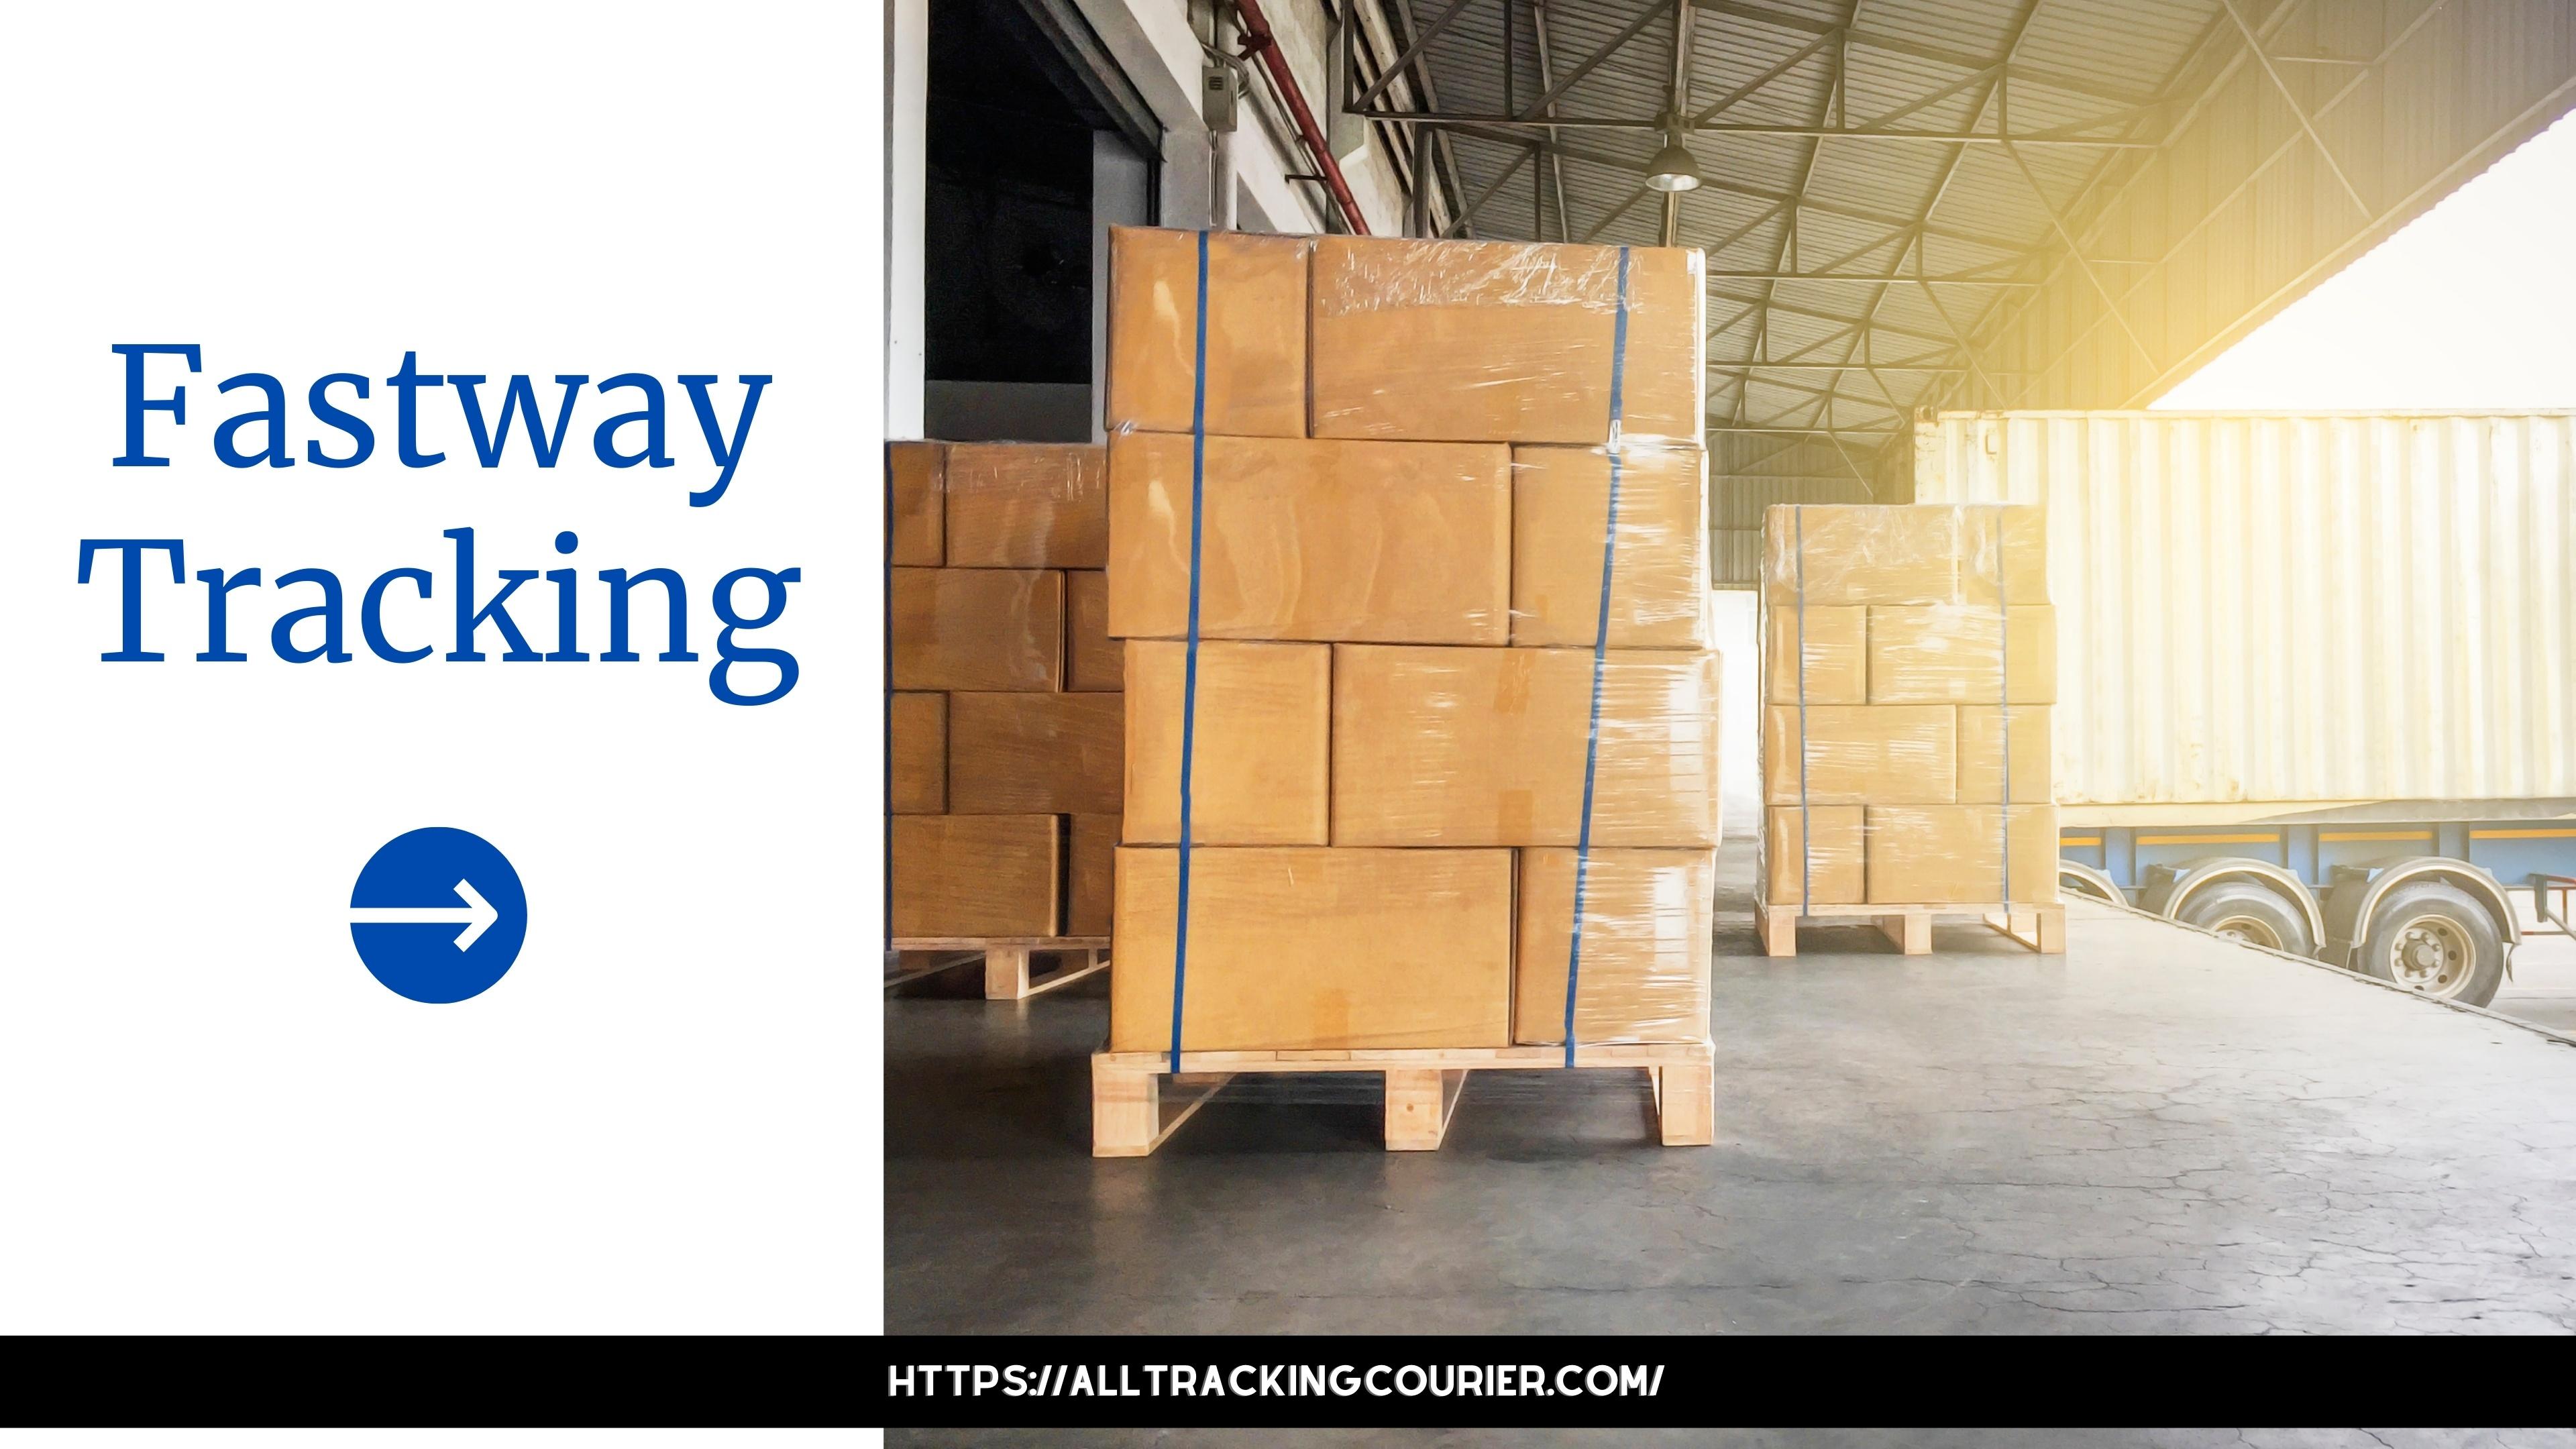 Fastway Tracking